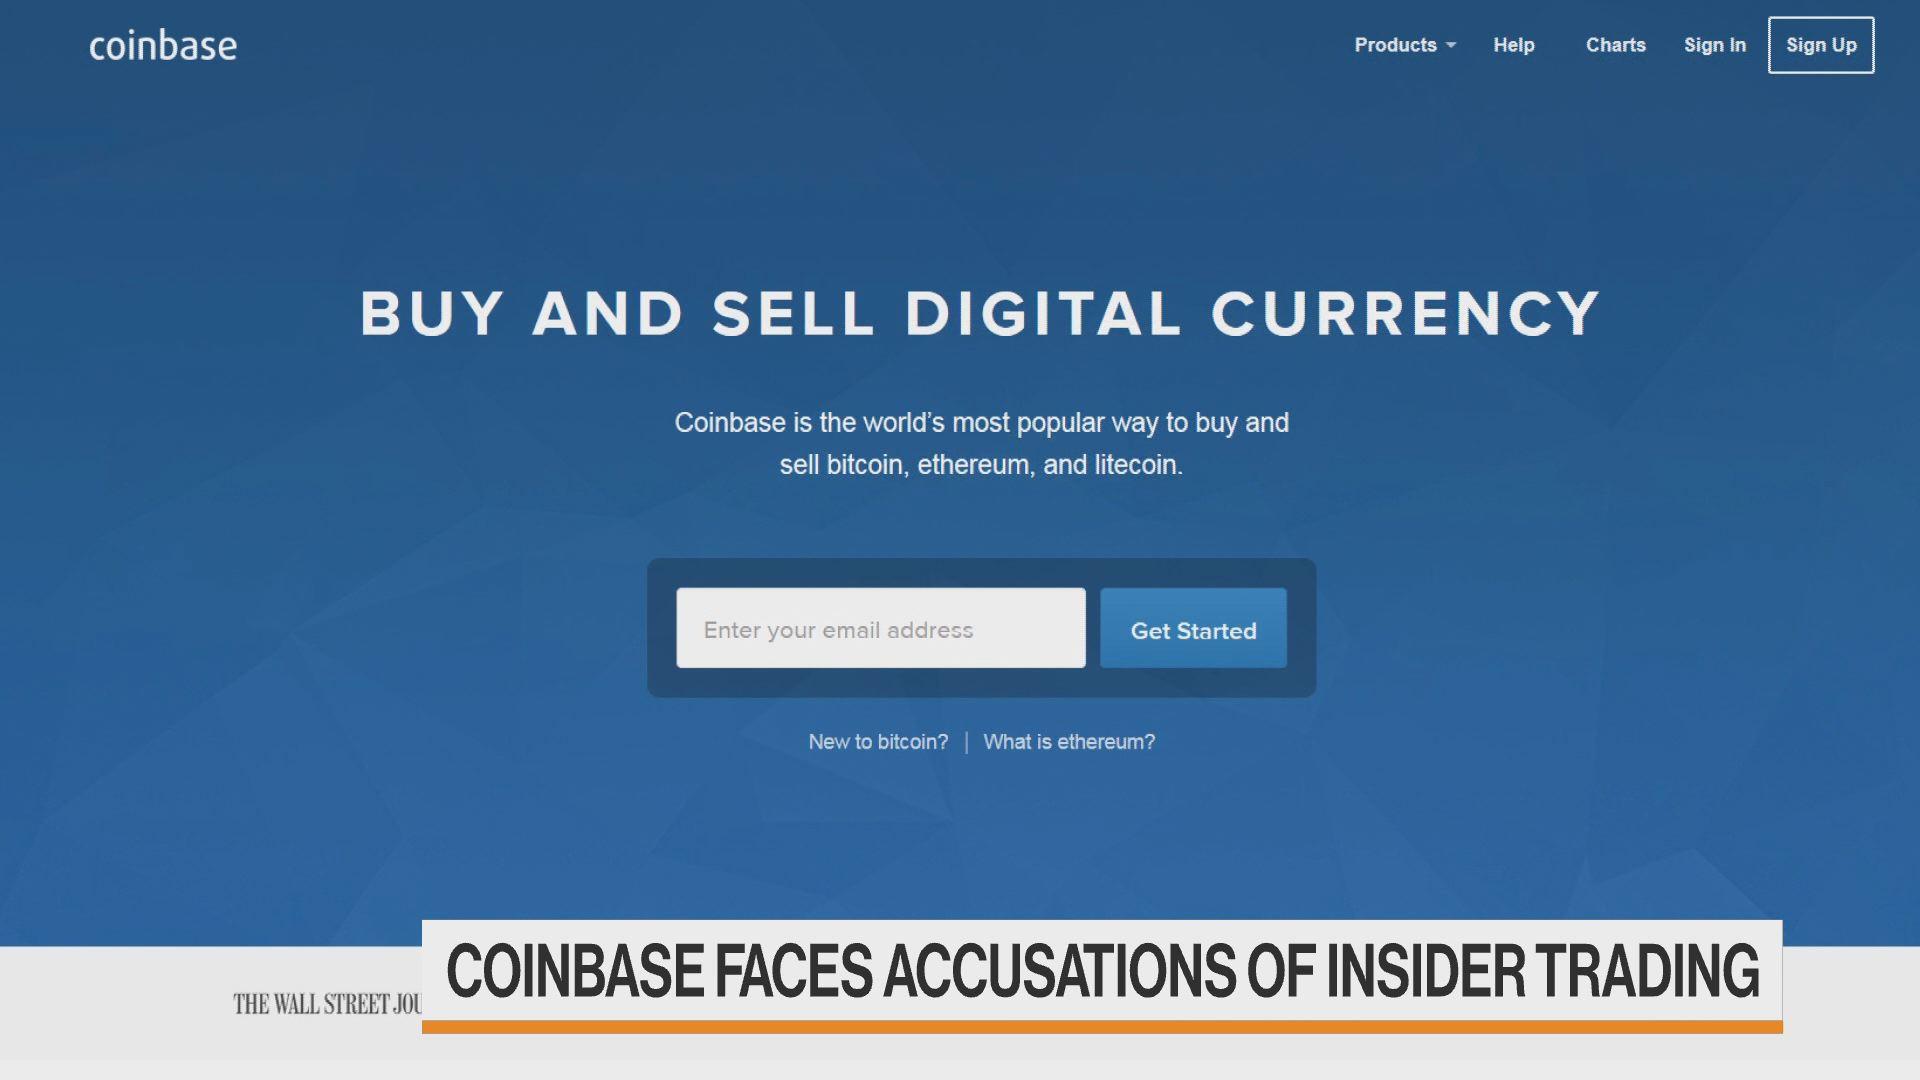 trunorth cryptocurrency fund advisors